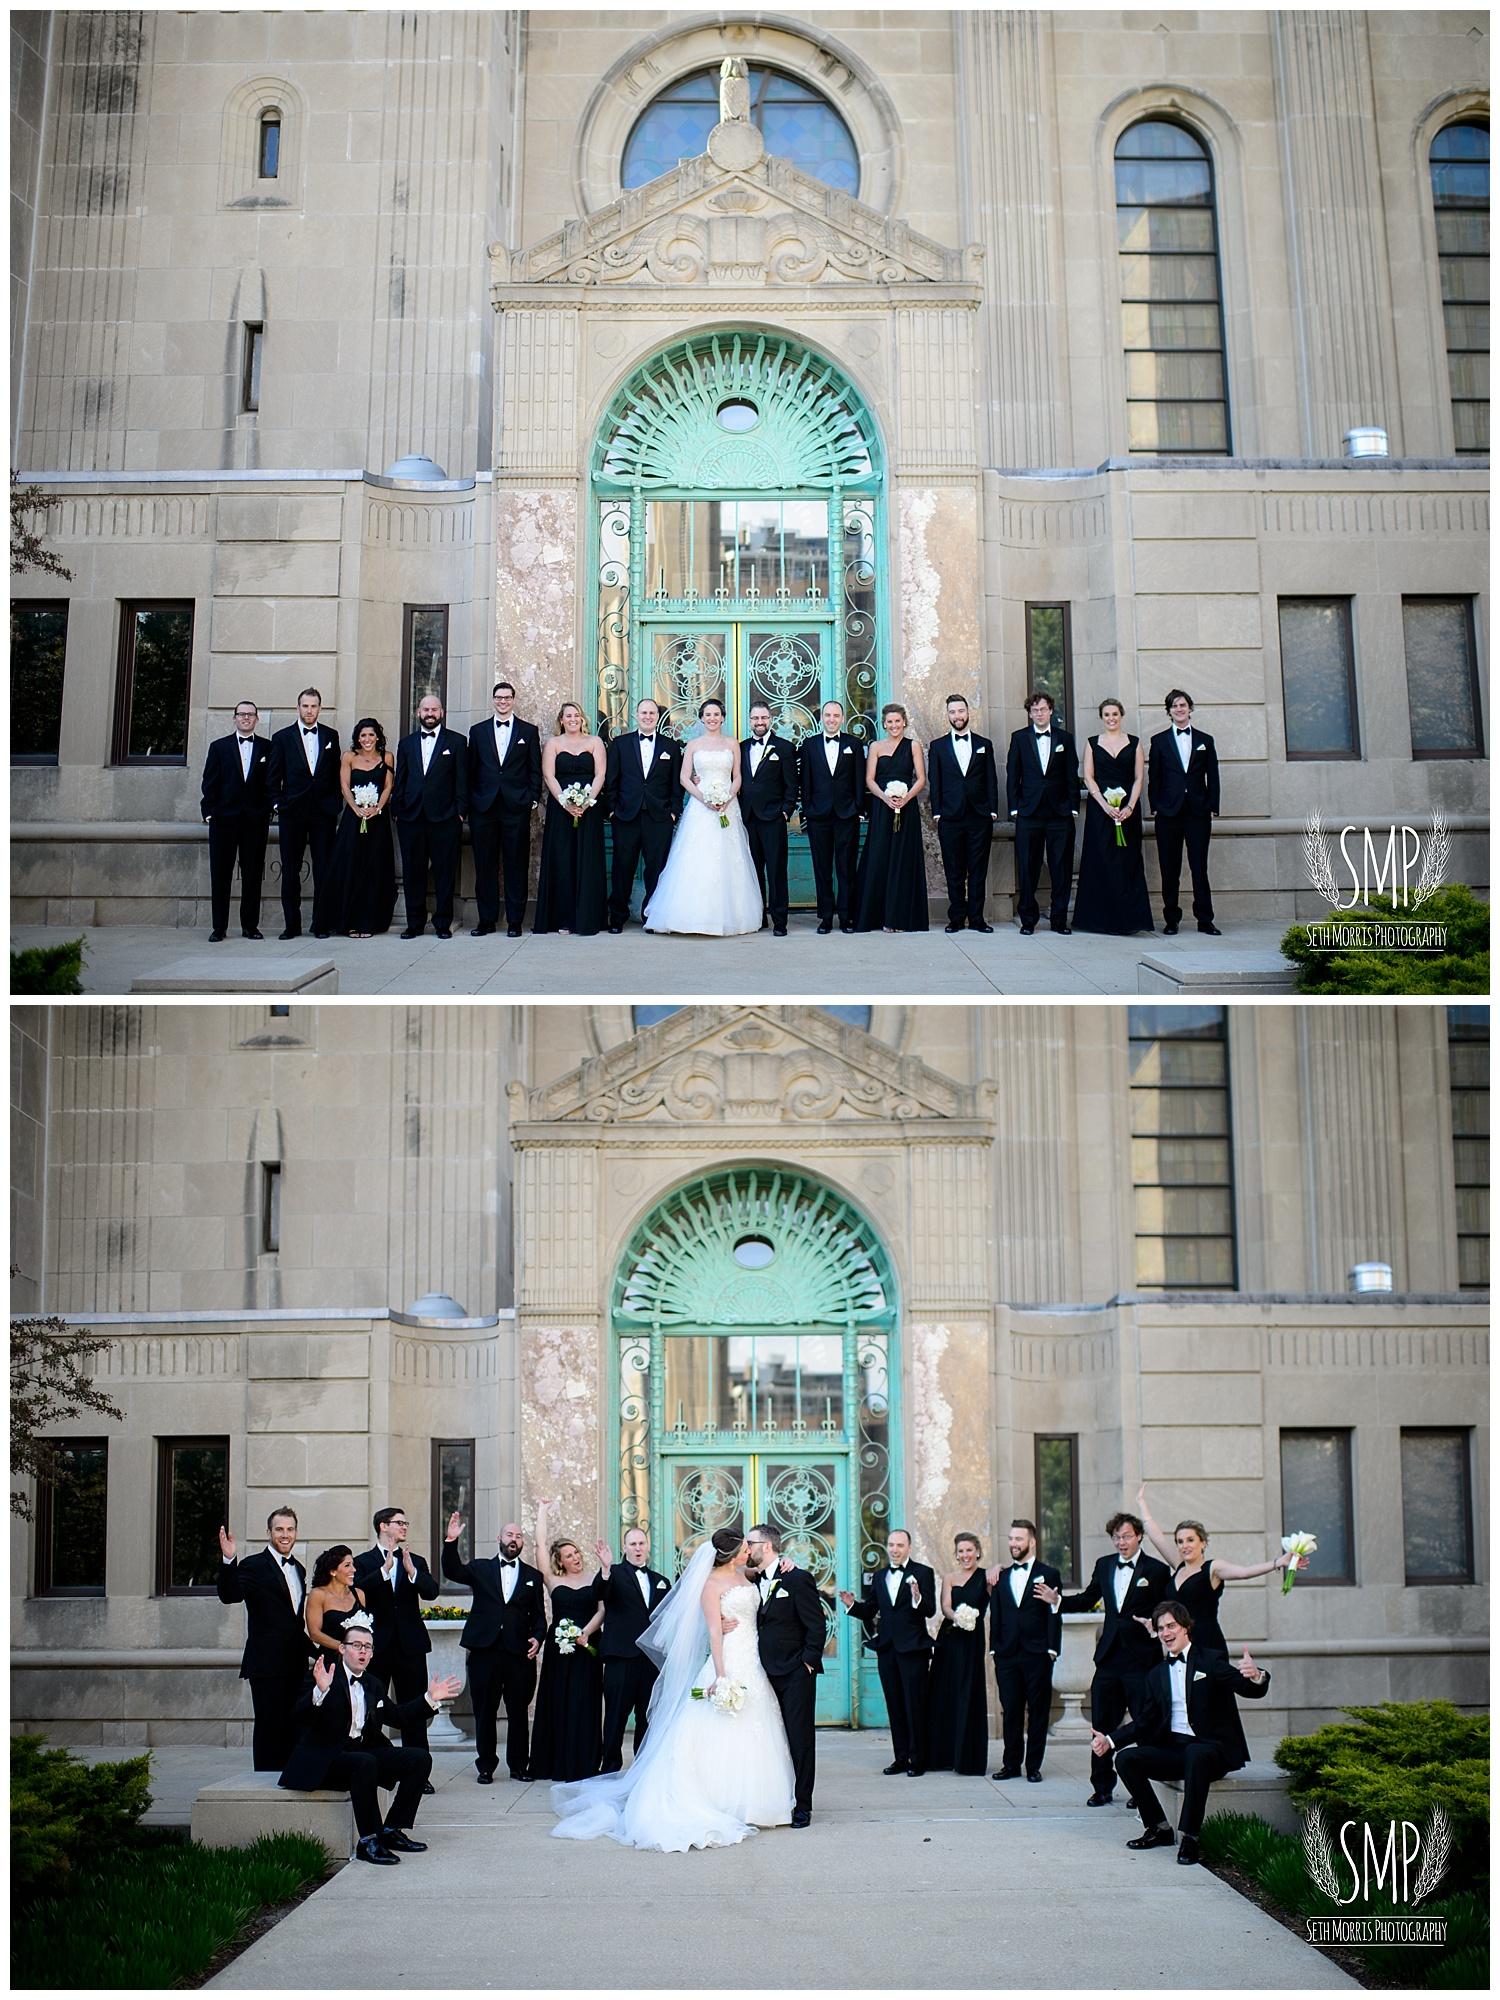 chicago-wedding-pictures-del-strada-hotel-allegro-80.jpg